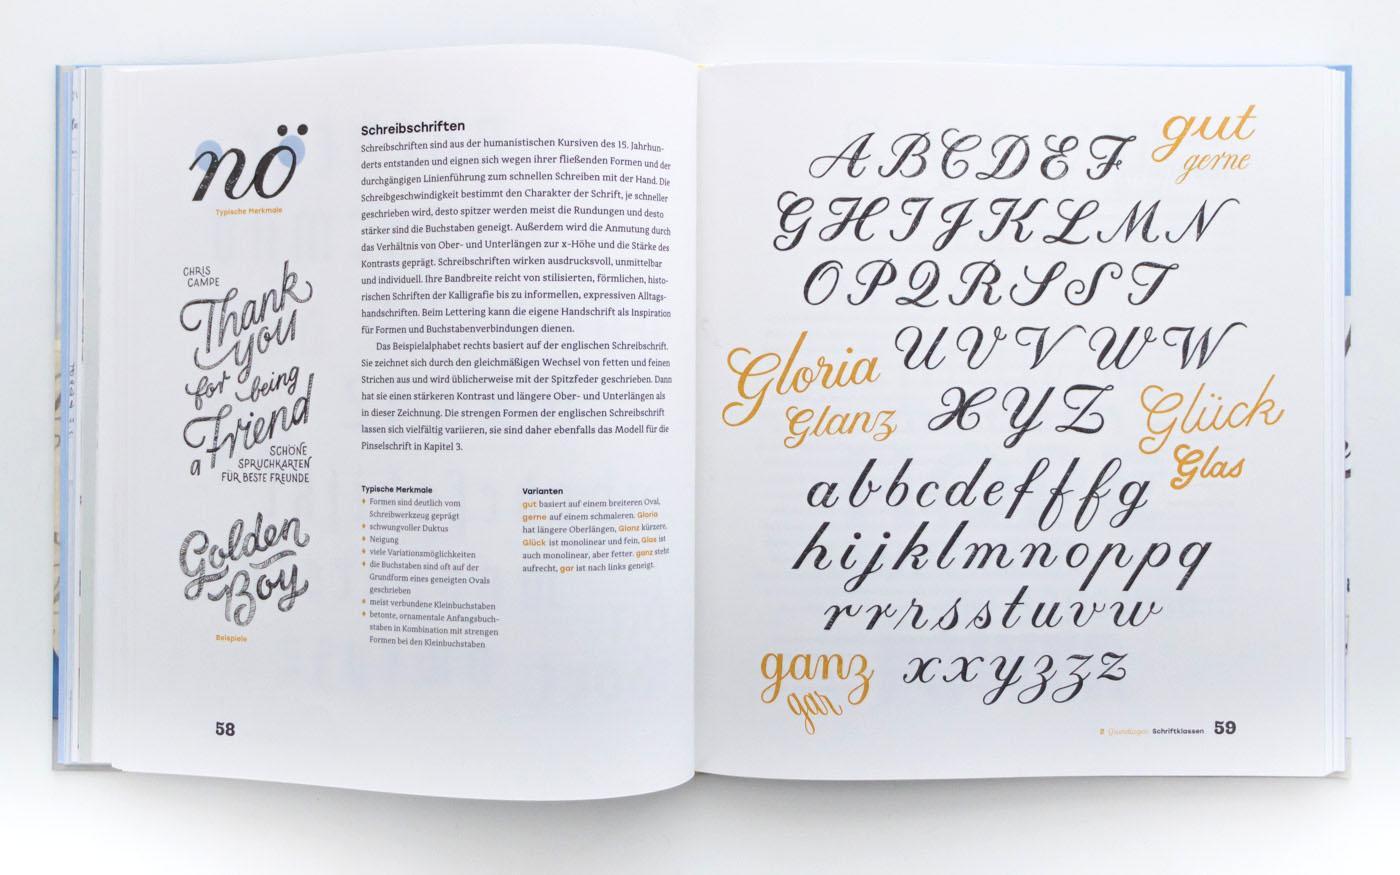 Campe_Handbuch-Handlettering_978-3-258-60165-6_-11.jpg